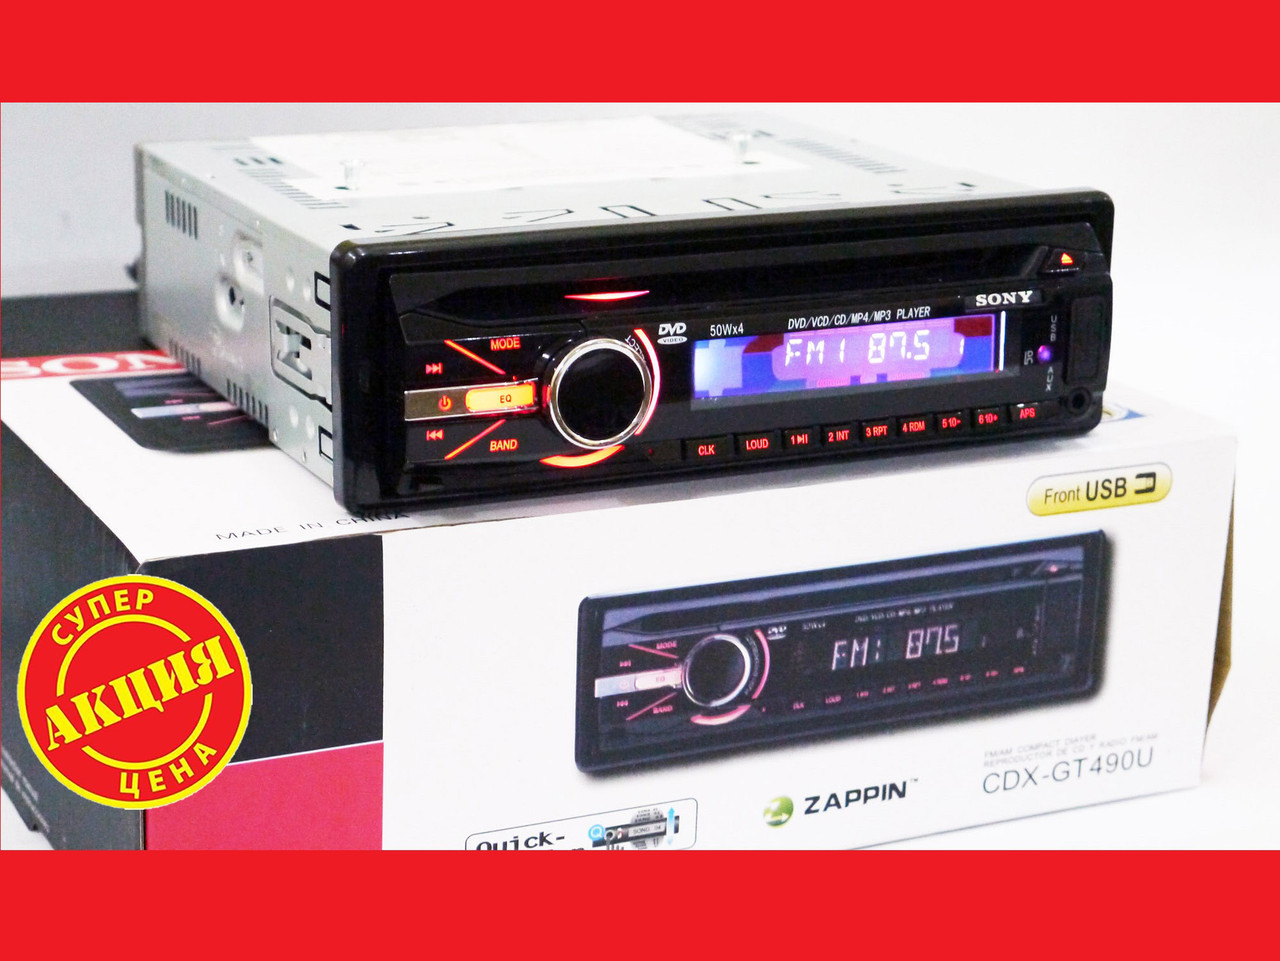 Sony CDX-GT490U DVD Автомагнитола USB+Sd+MMC съемная панель